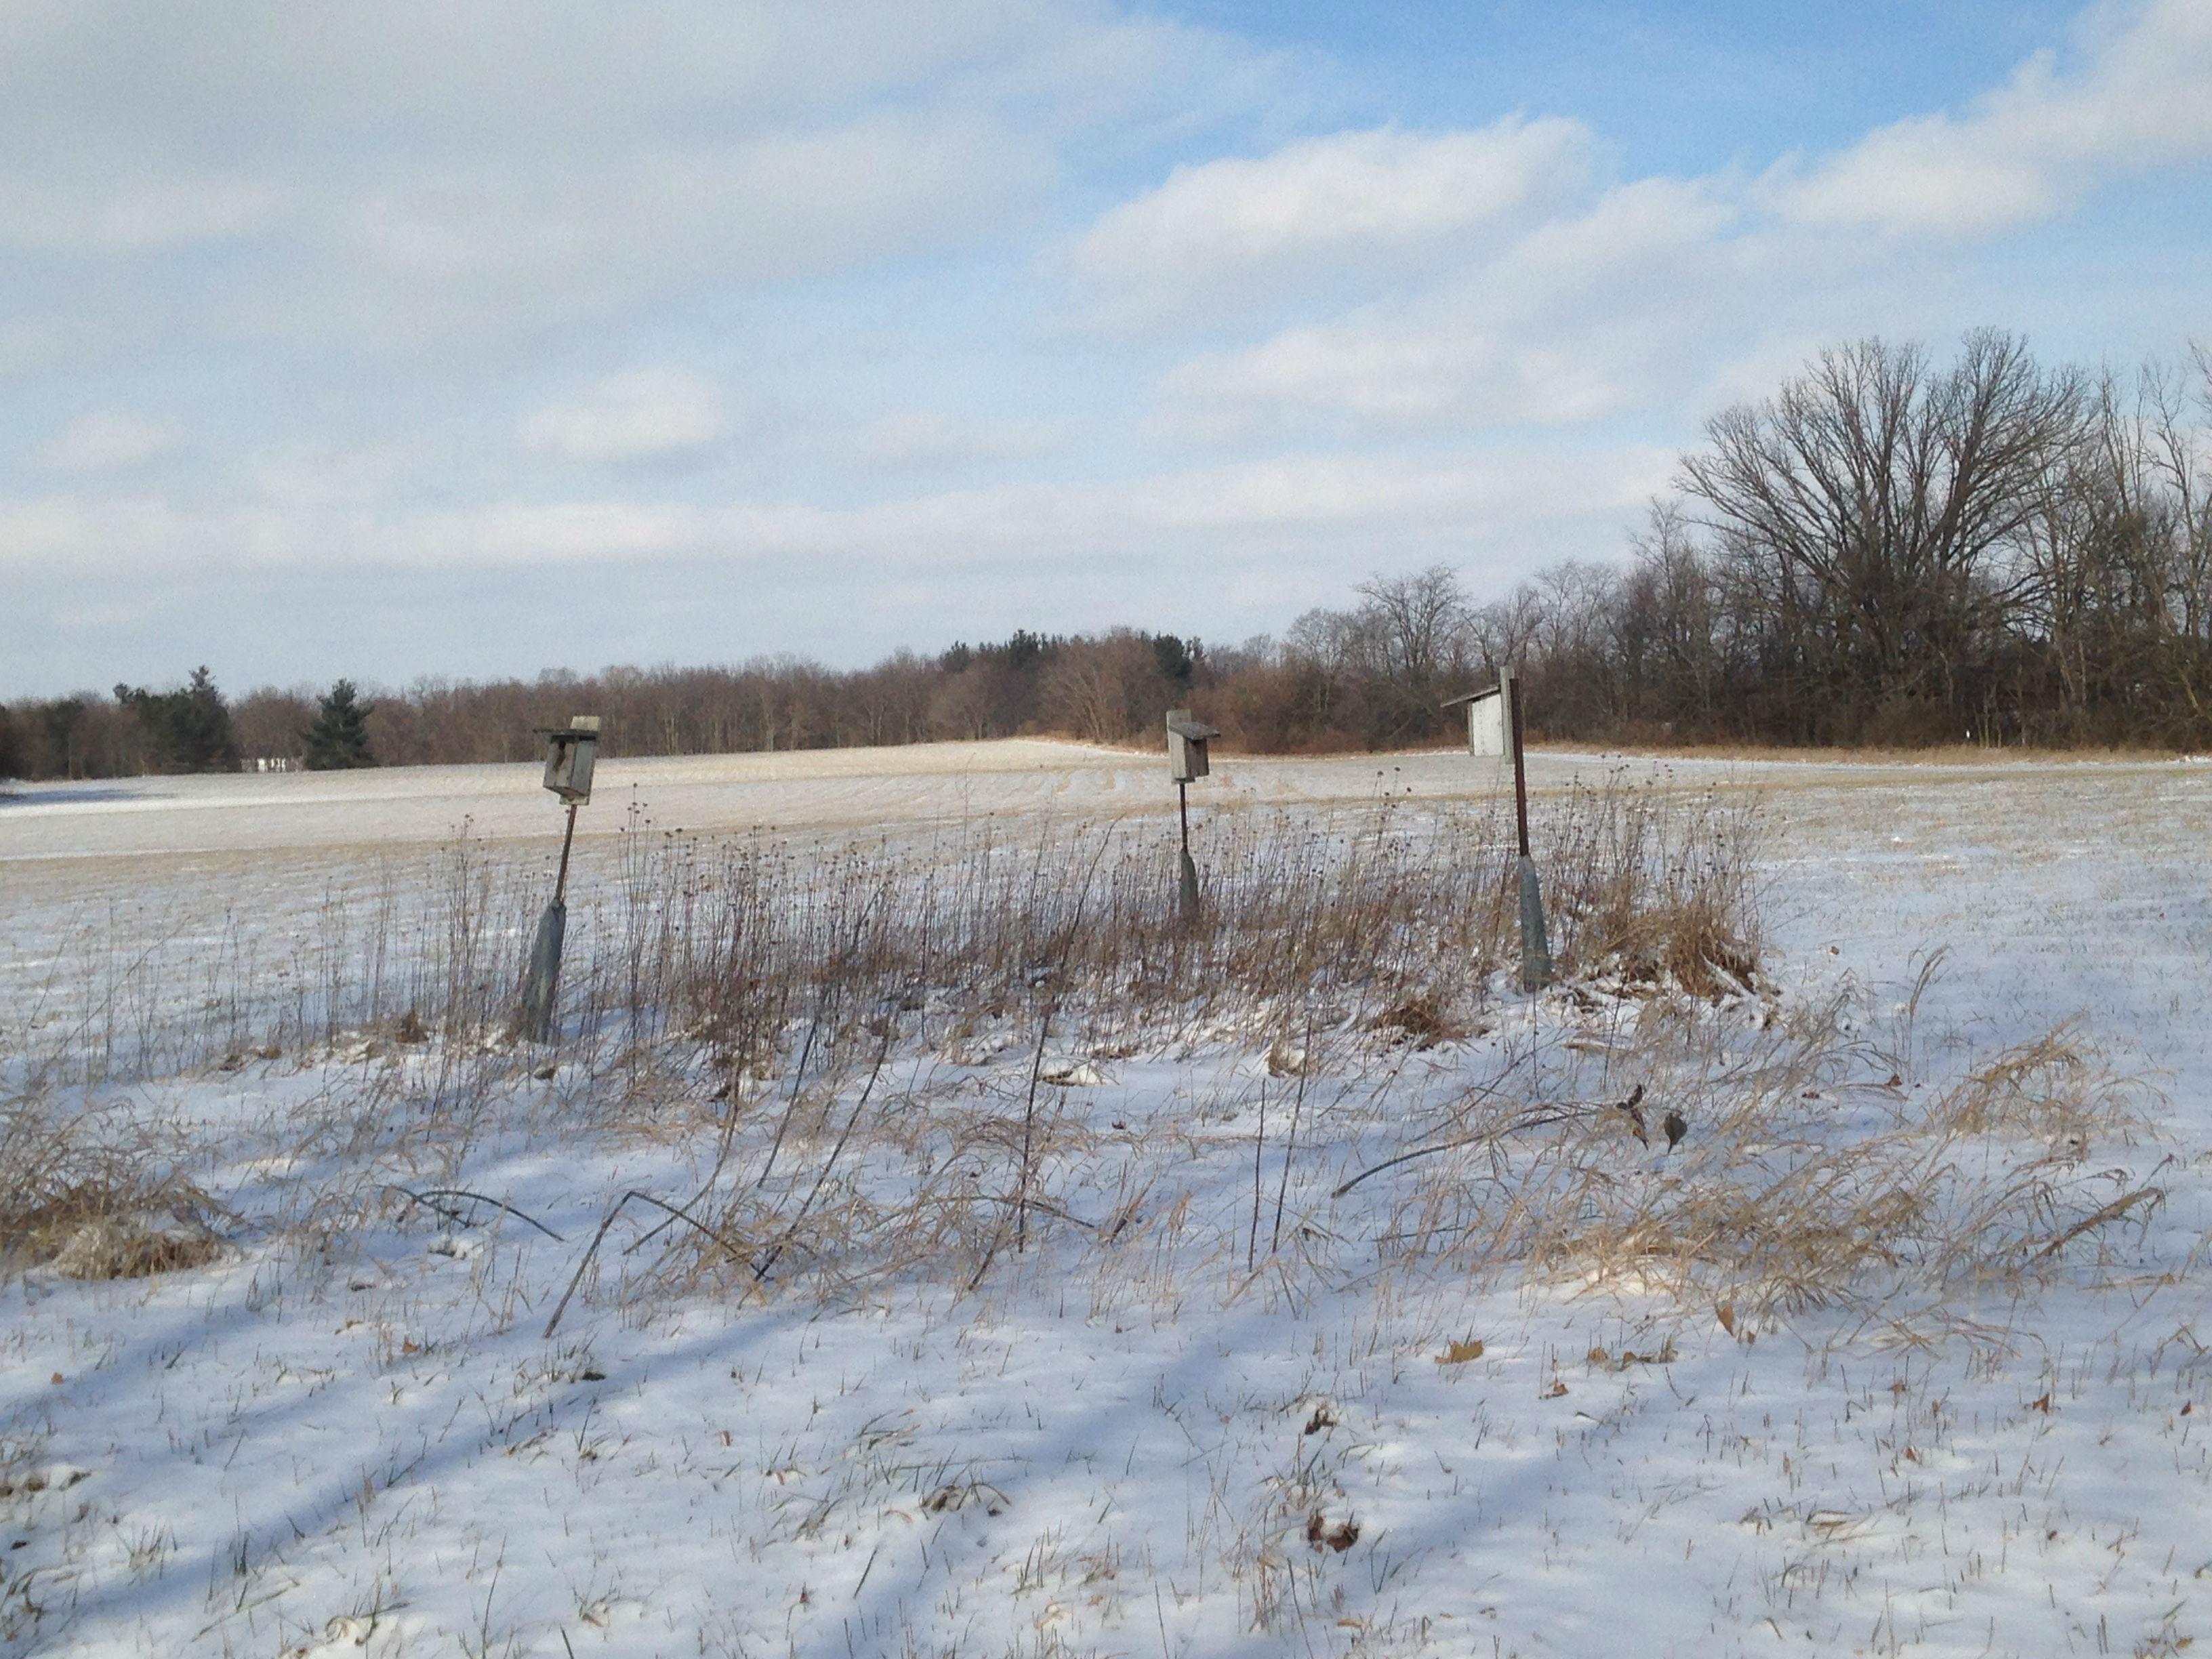 Bluffton University Nature Preserve, Ohio: Winter Liminal